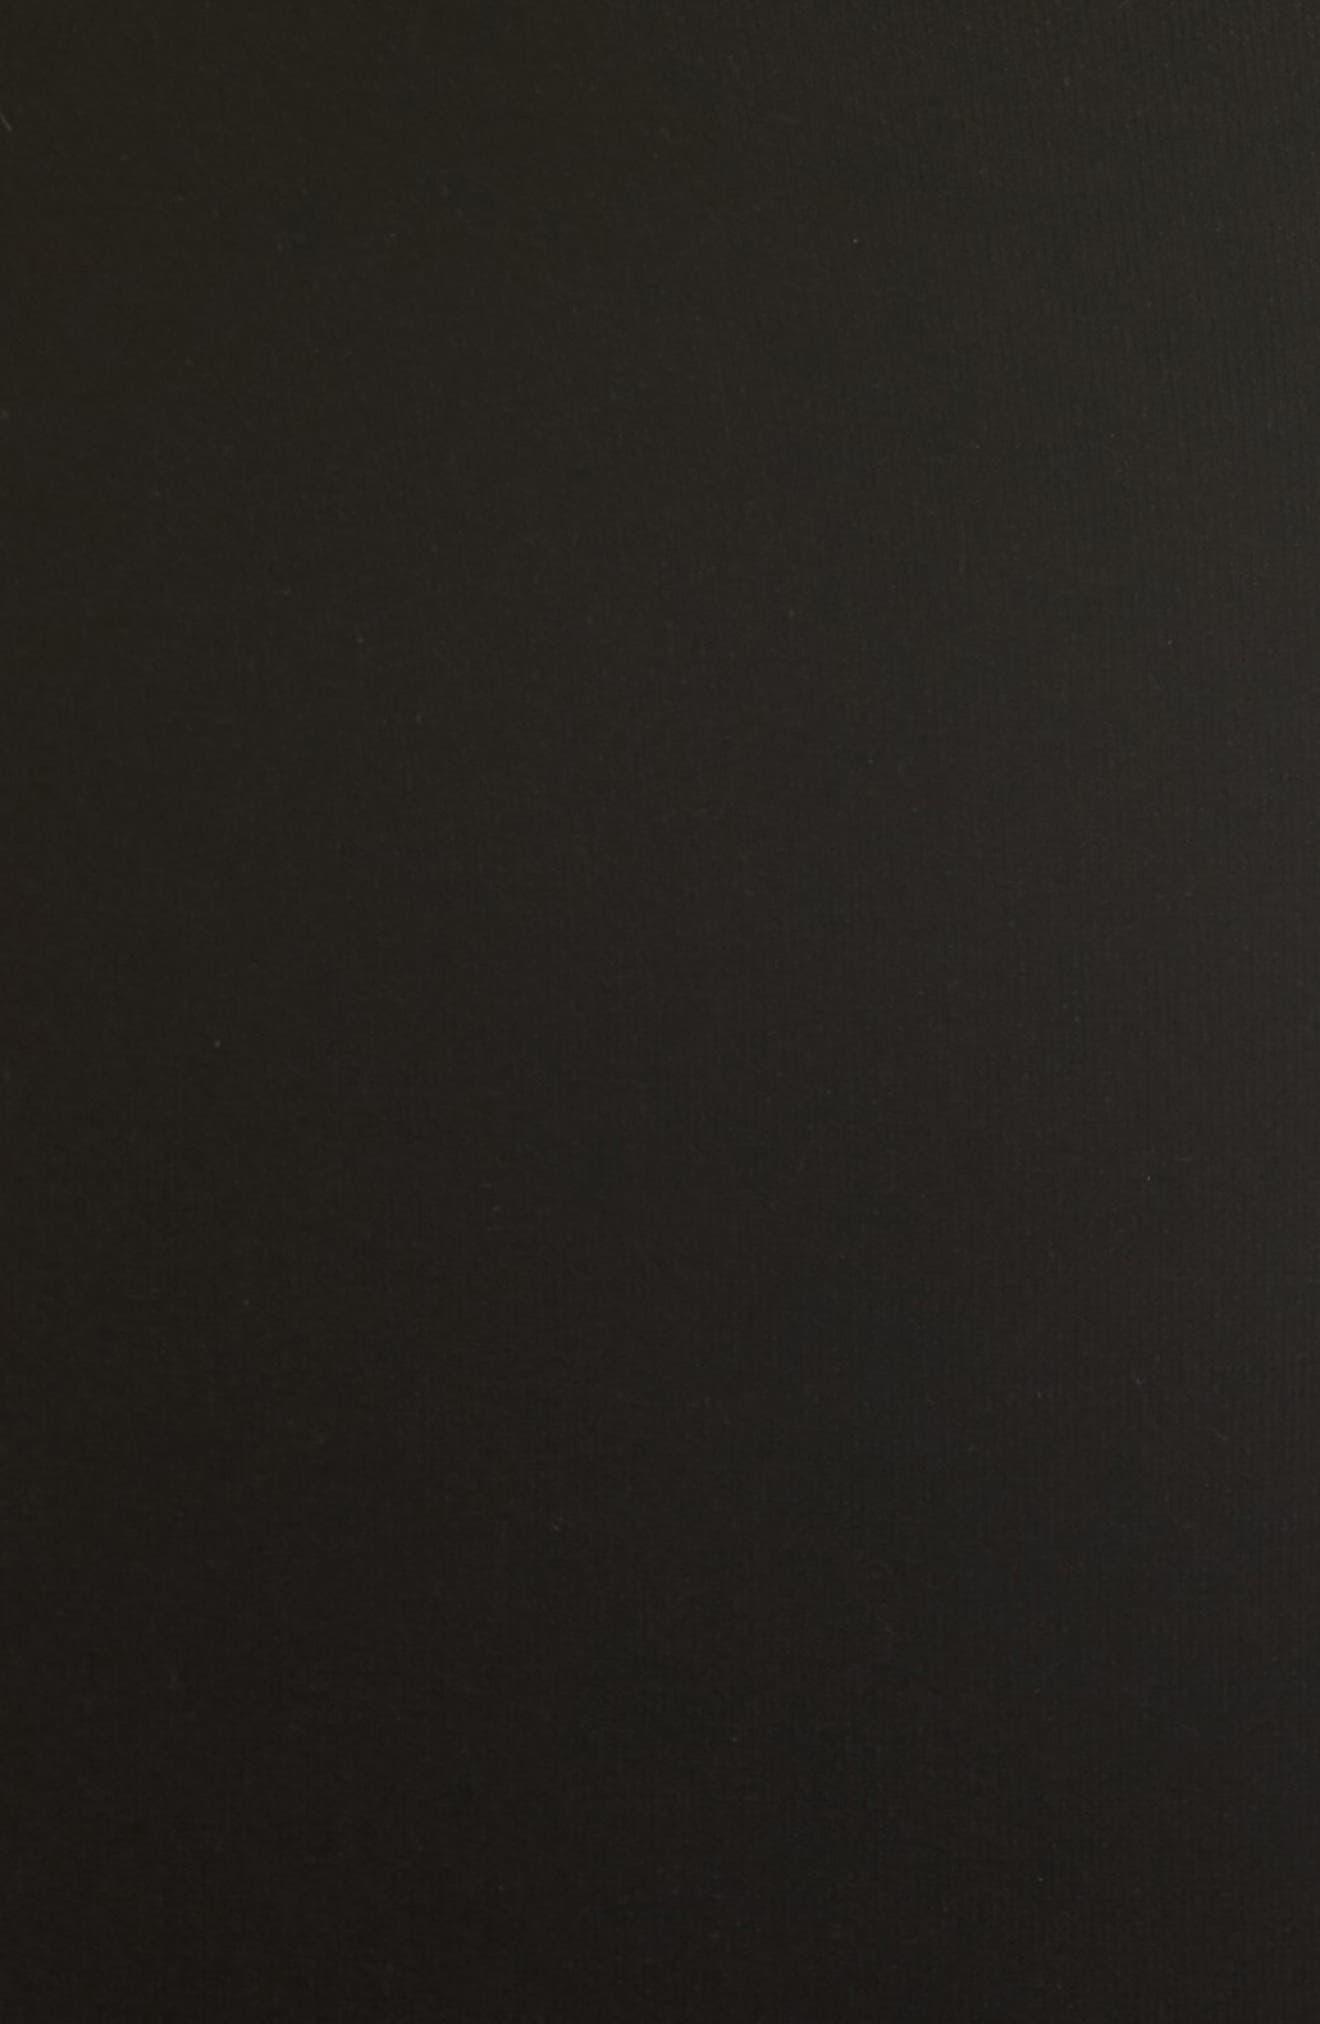 Contrast Lined Bell Sleeve Sheath Dress,                             Alternate thumbnail 5, color,                             Black/ Cherry